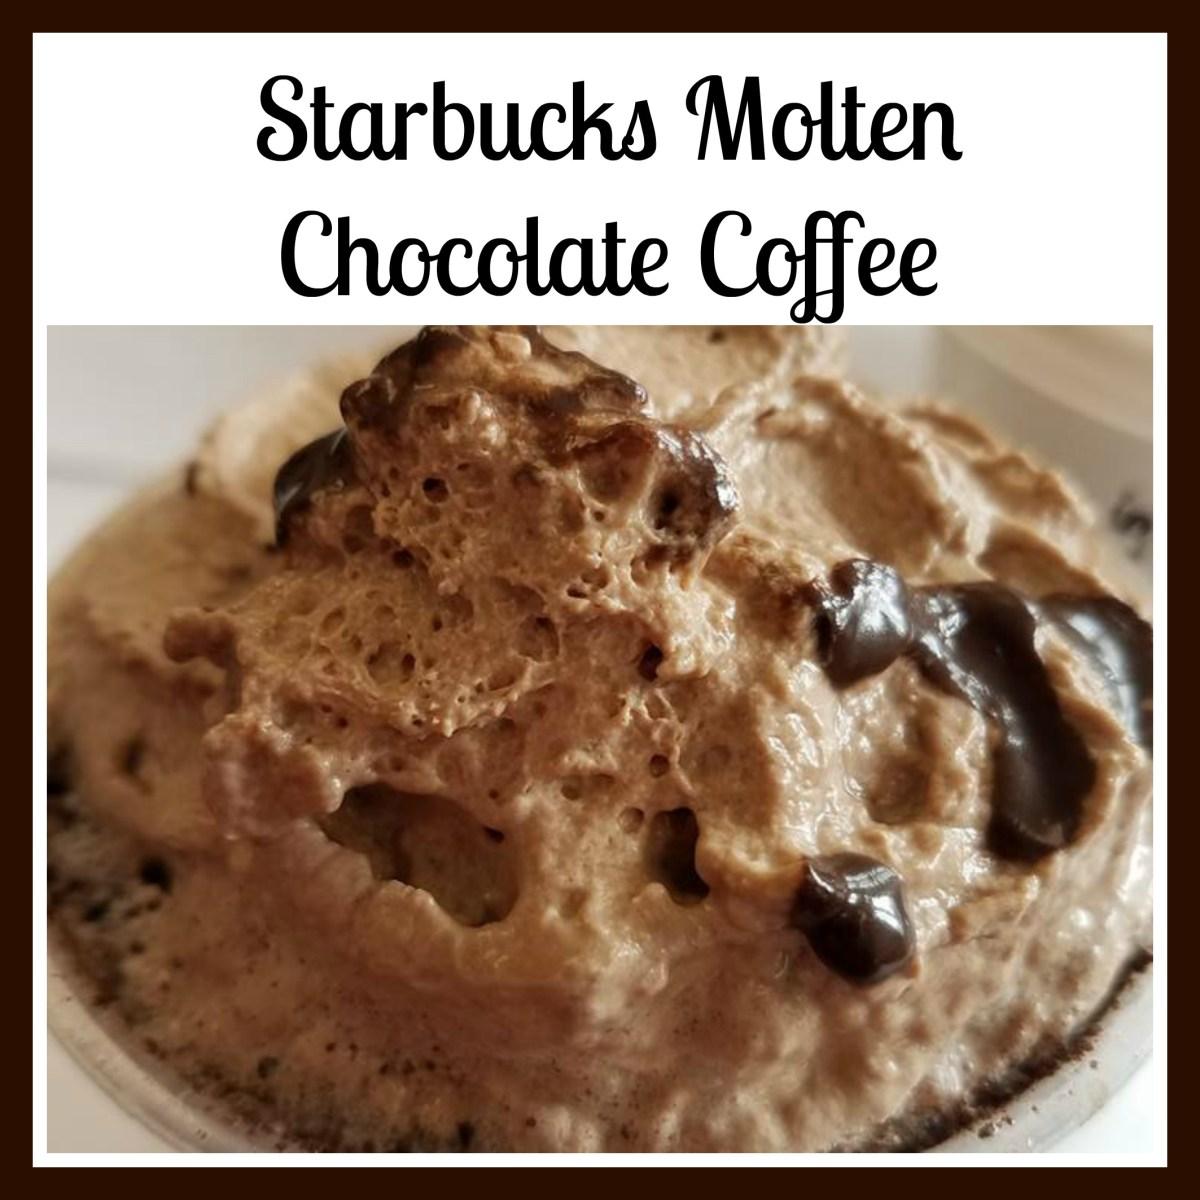 Starbucks Molten Chocolate Coffee